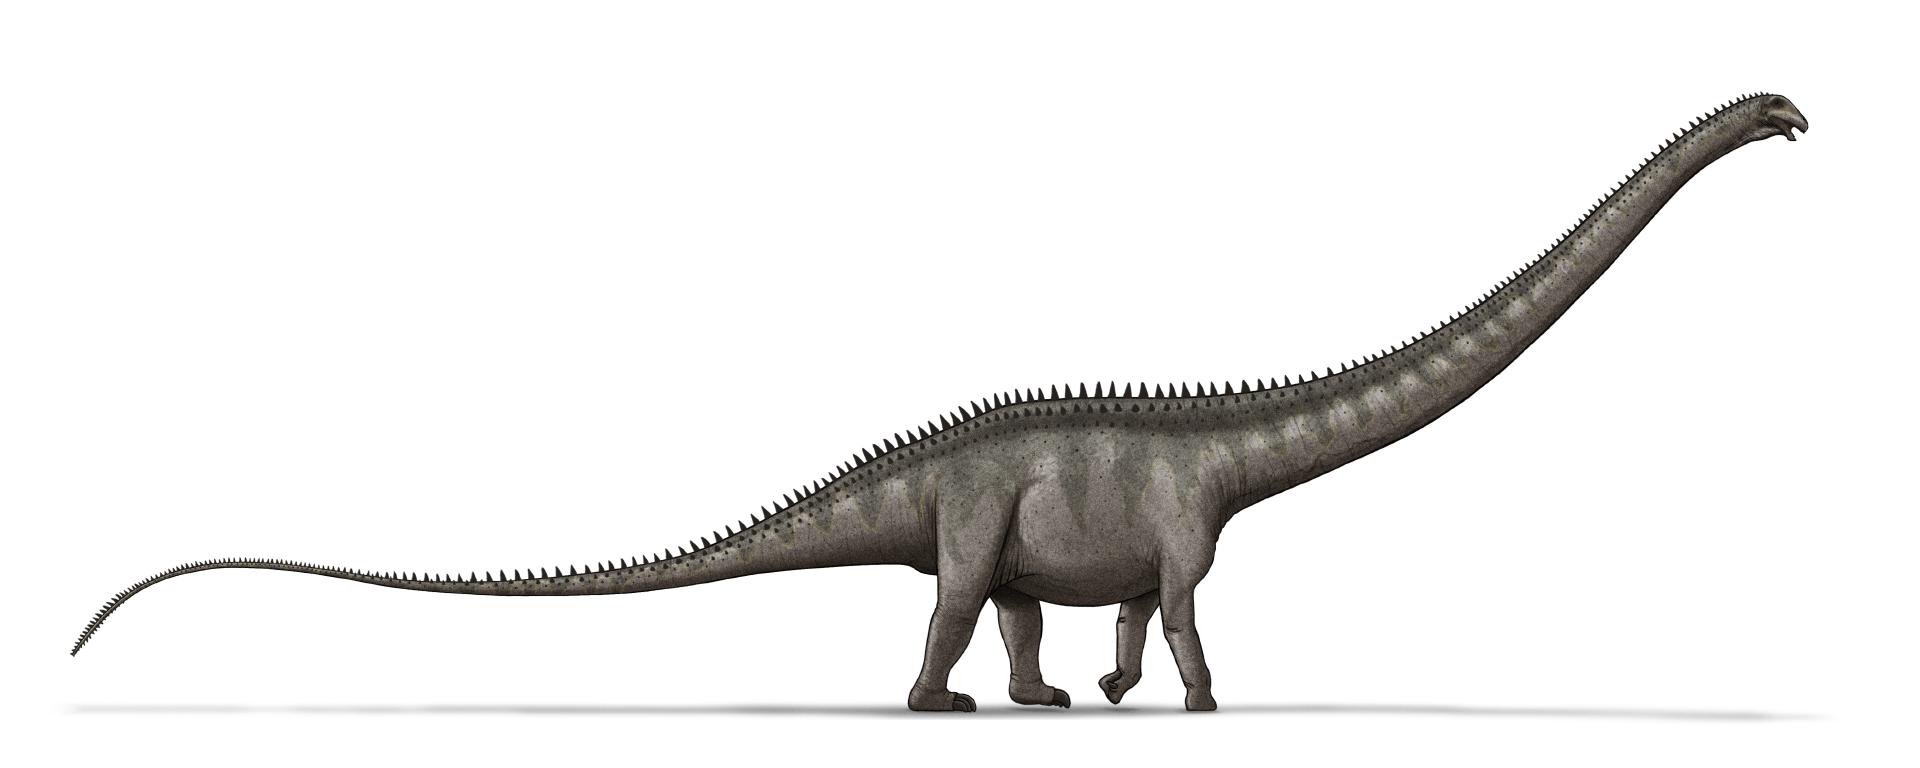 File Supersaurus Dinosaur Png Wikimedia Commons Tyrannosaurus velociraptor indoraptor dinosaur indominus rex, dinosaur png. https commons wikimedia org wiki file supersaurus dinosaur png